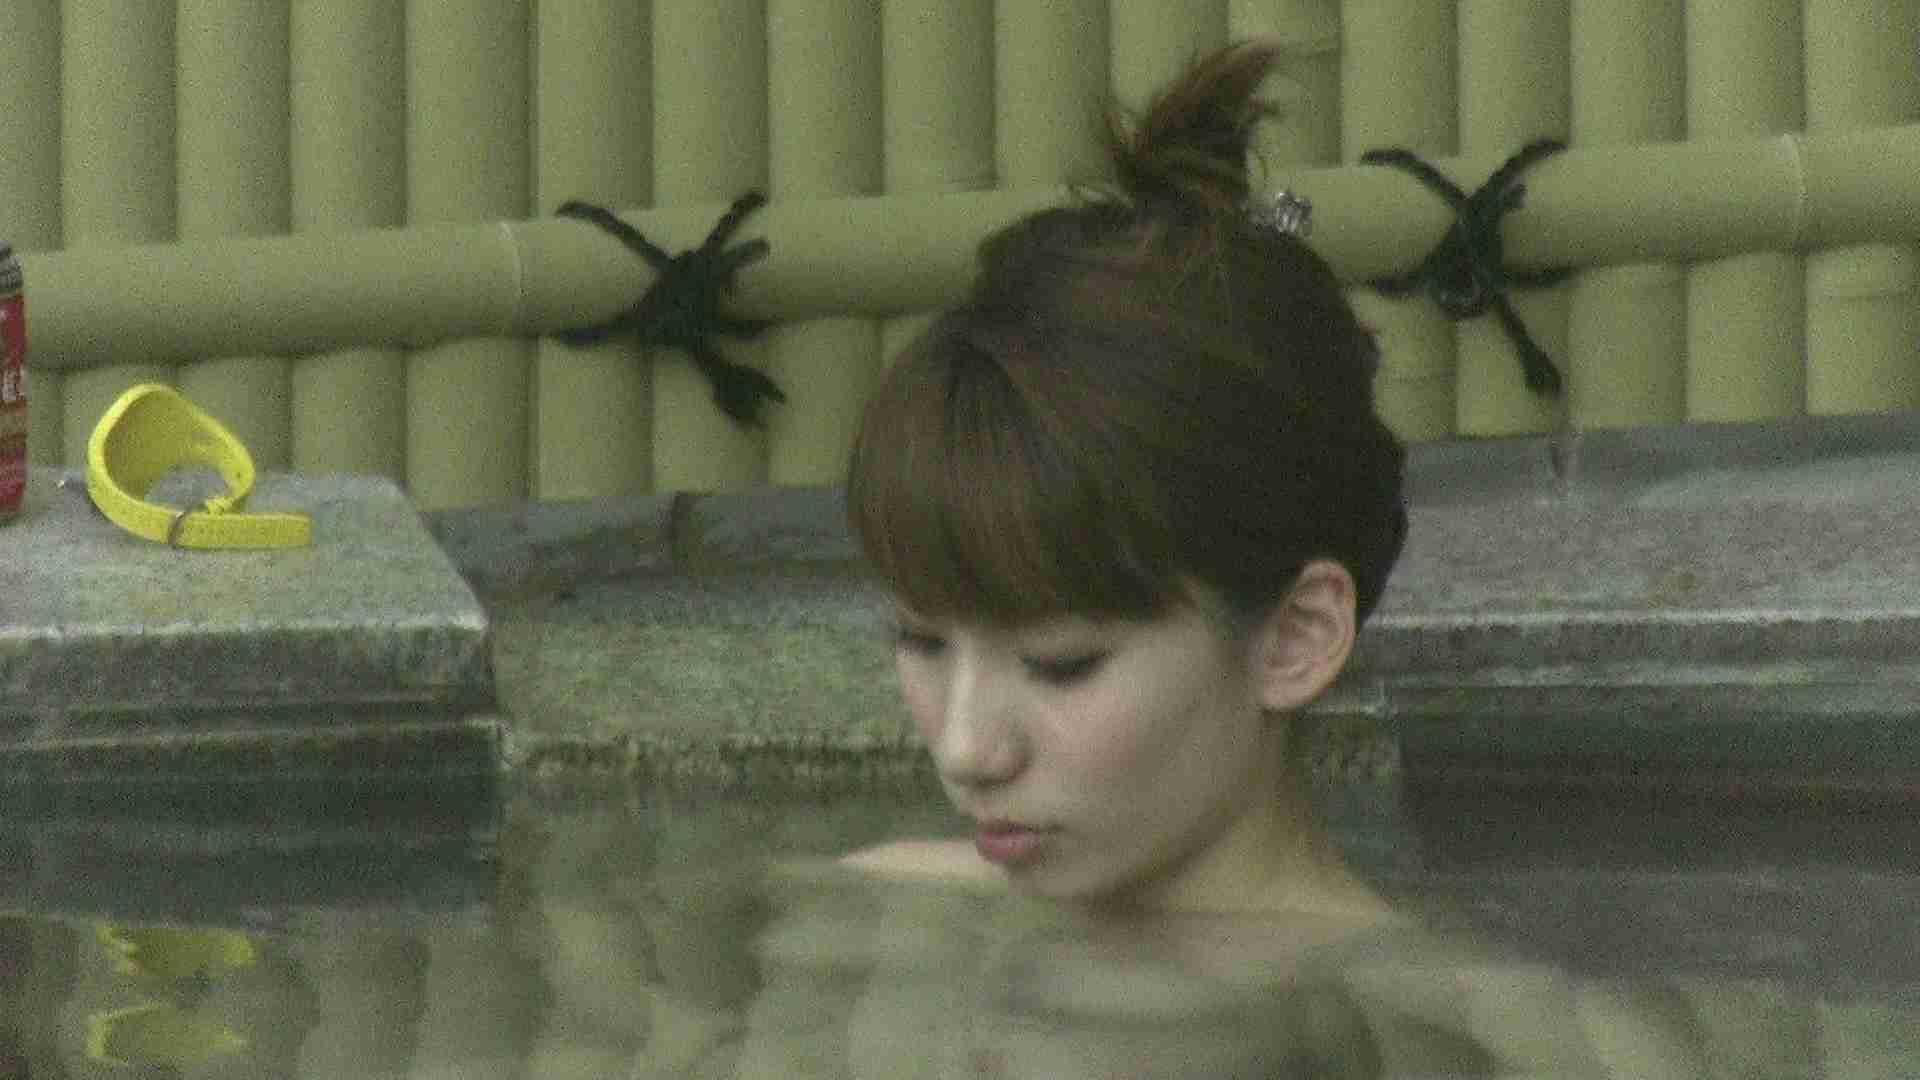 Aquaな露天風呂Vol.208 OLセックス   露天  85画像 28